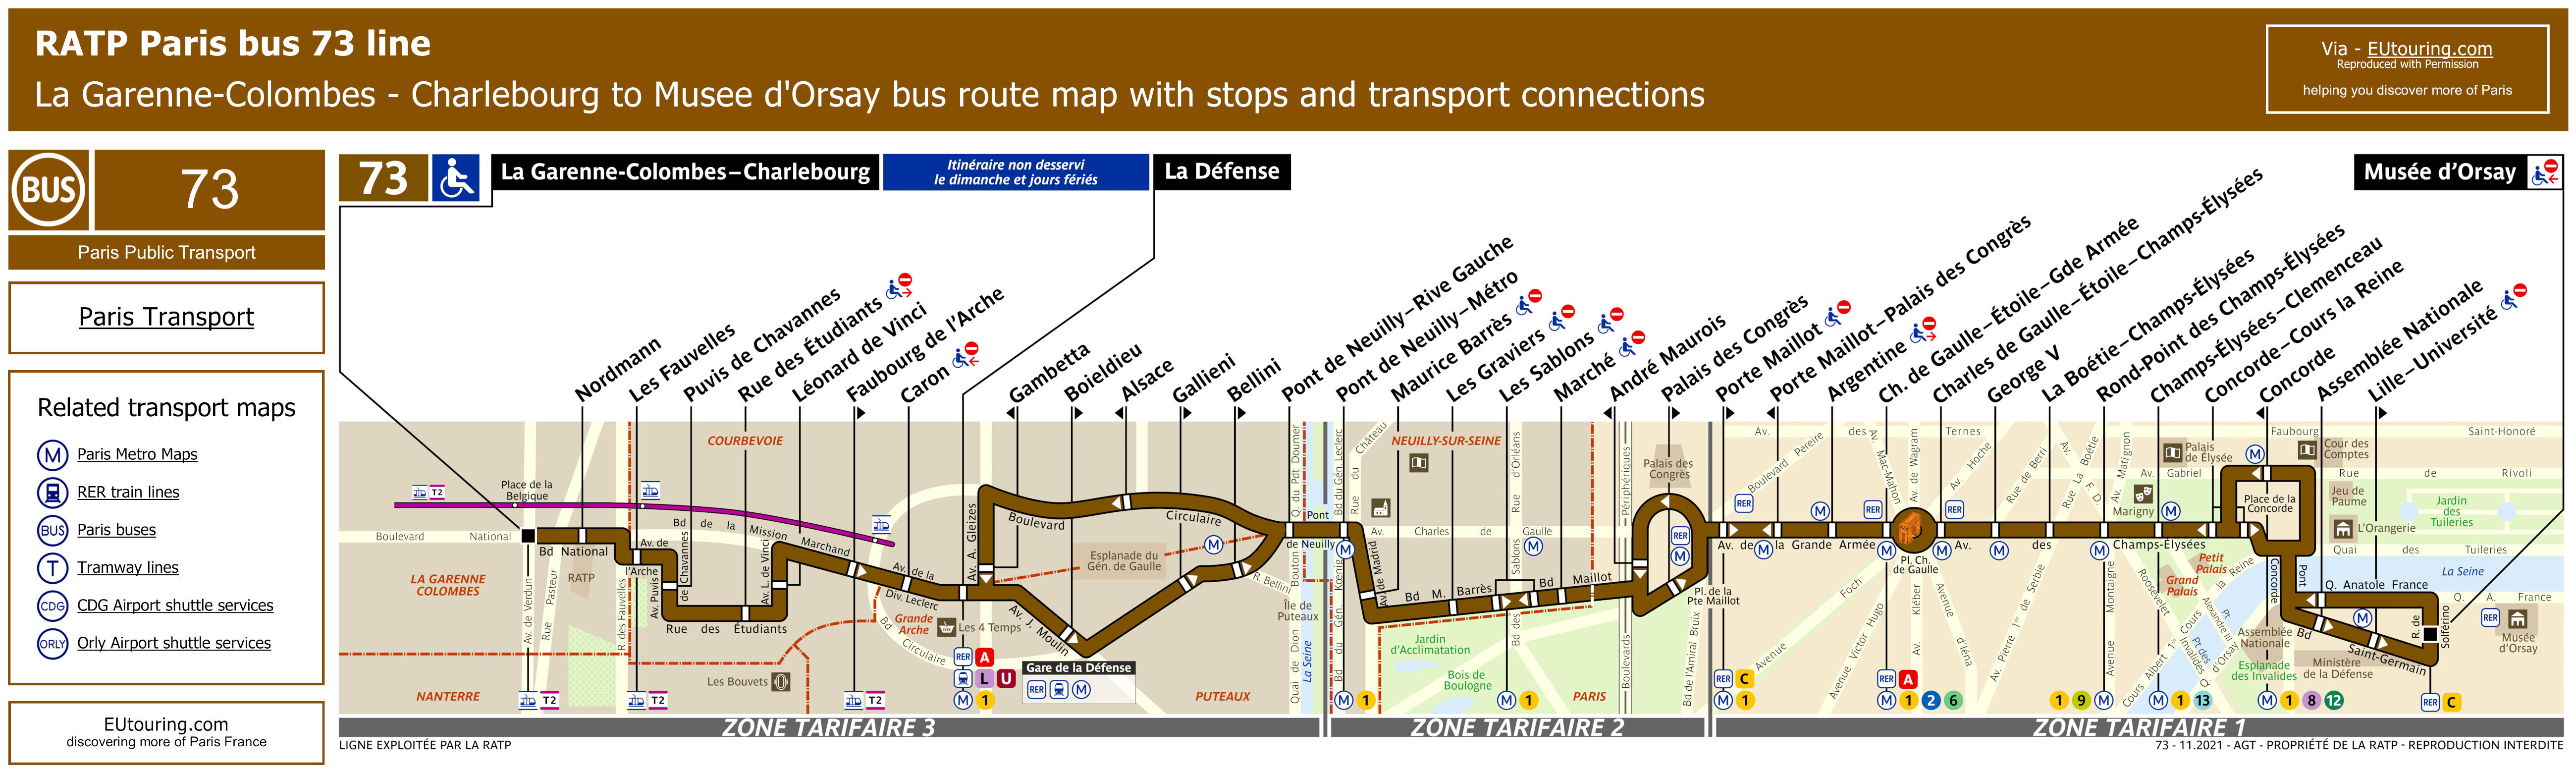 Ratp Route Maps For Paris Bus Lines 70 Through To 79